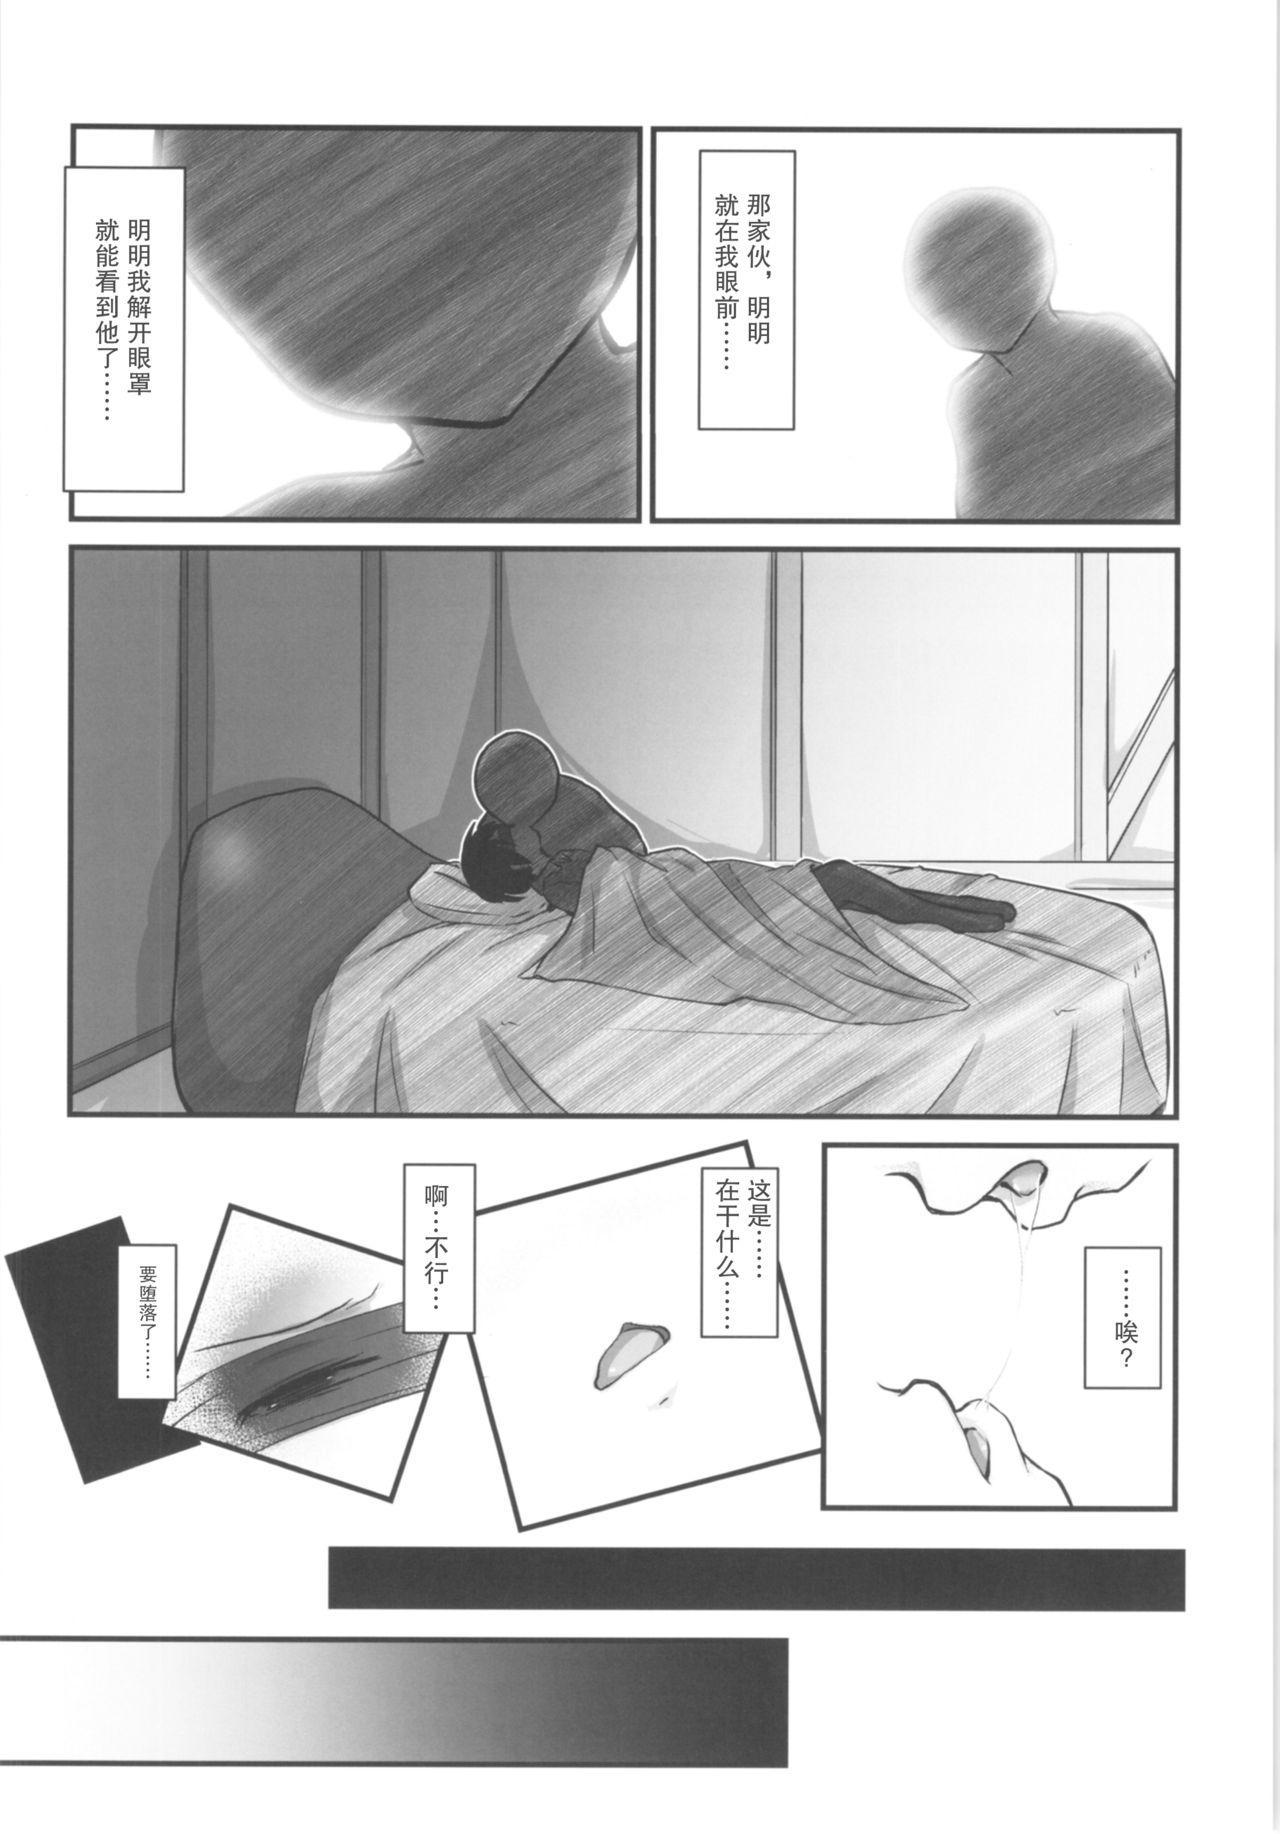 [Umari-ya (D-2)] Kiriko Route Another #05 ~Seifuku Josou Anal Junchi Hen~ (Sword Art Online) ) [Chinese] [不可视汉化] 39